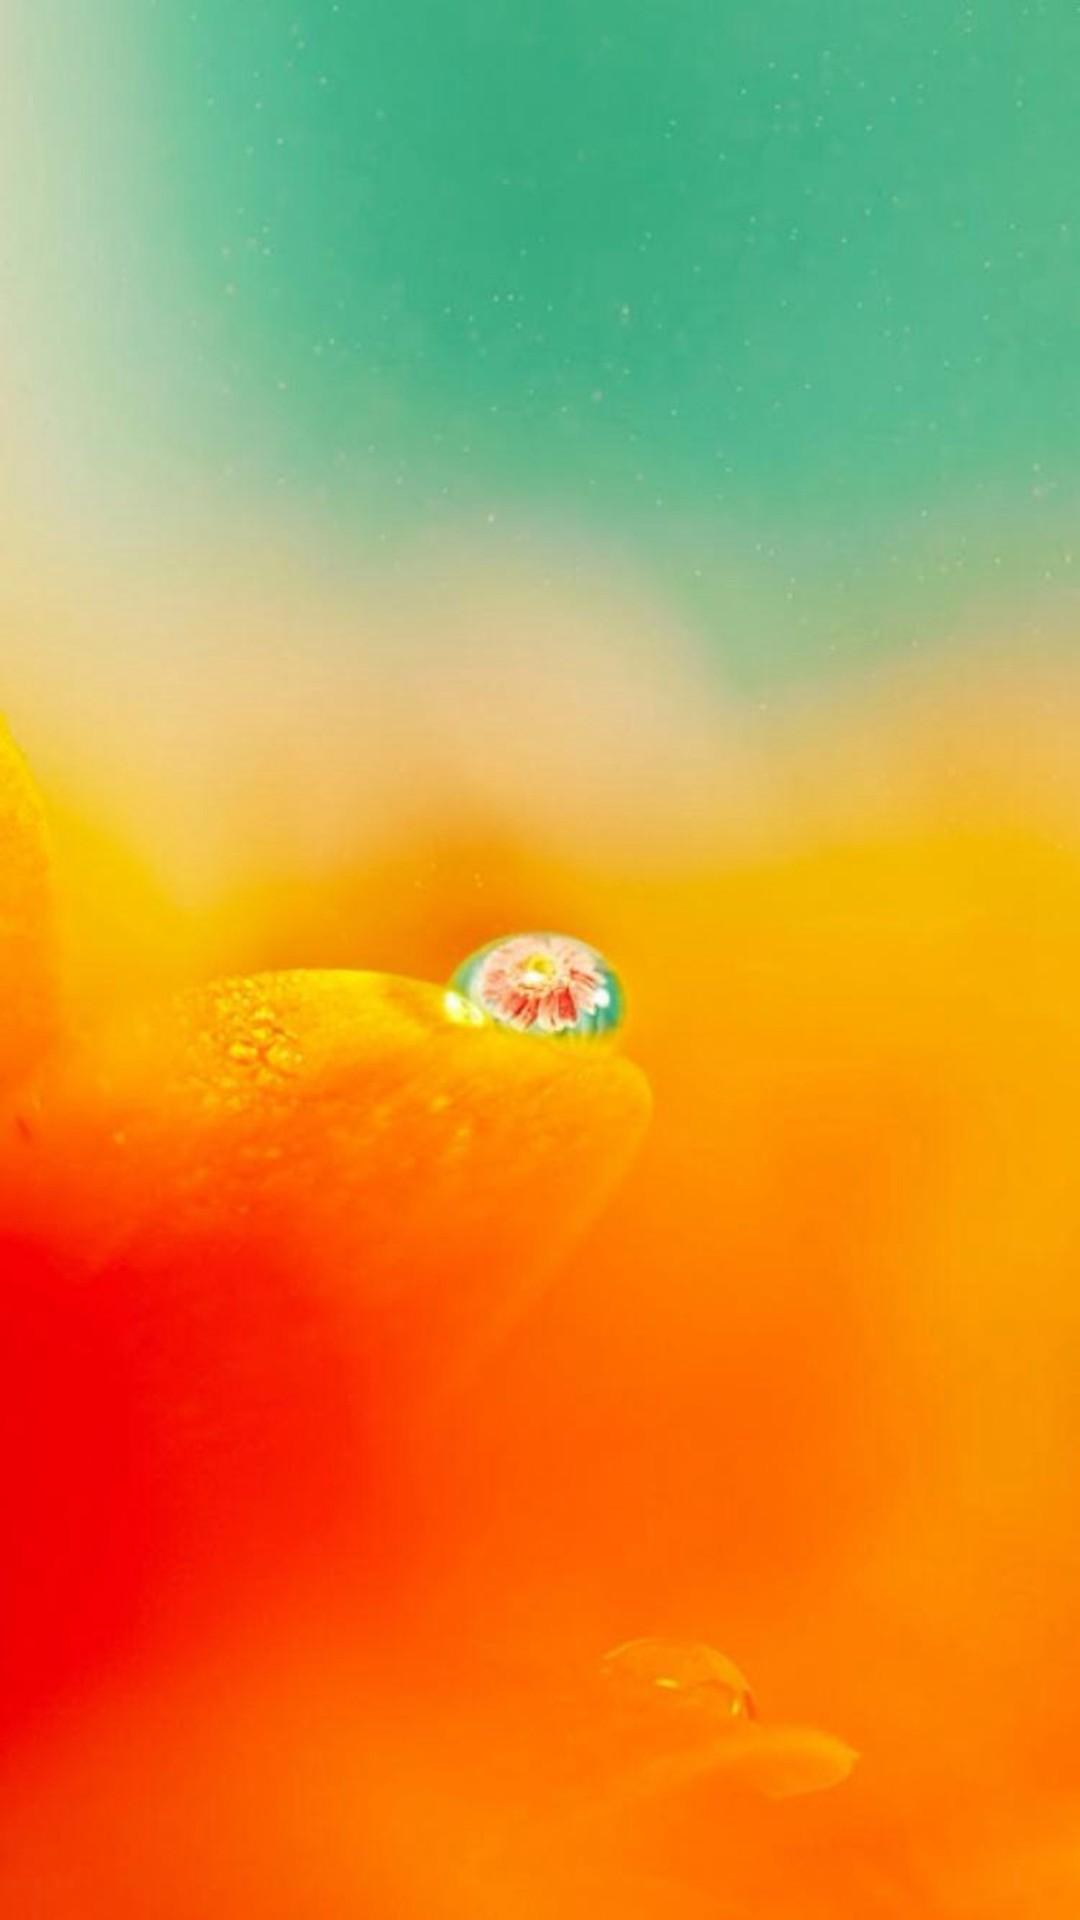 Nature Blurry Pure Orange Flower Petal Dew Waterdrop iPhone 8 wallpaper